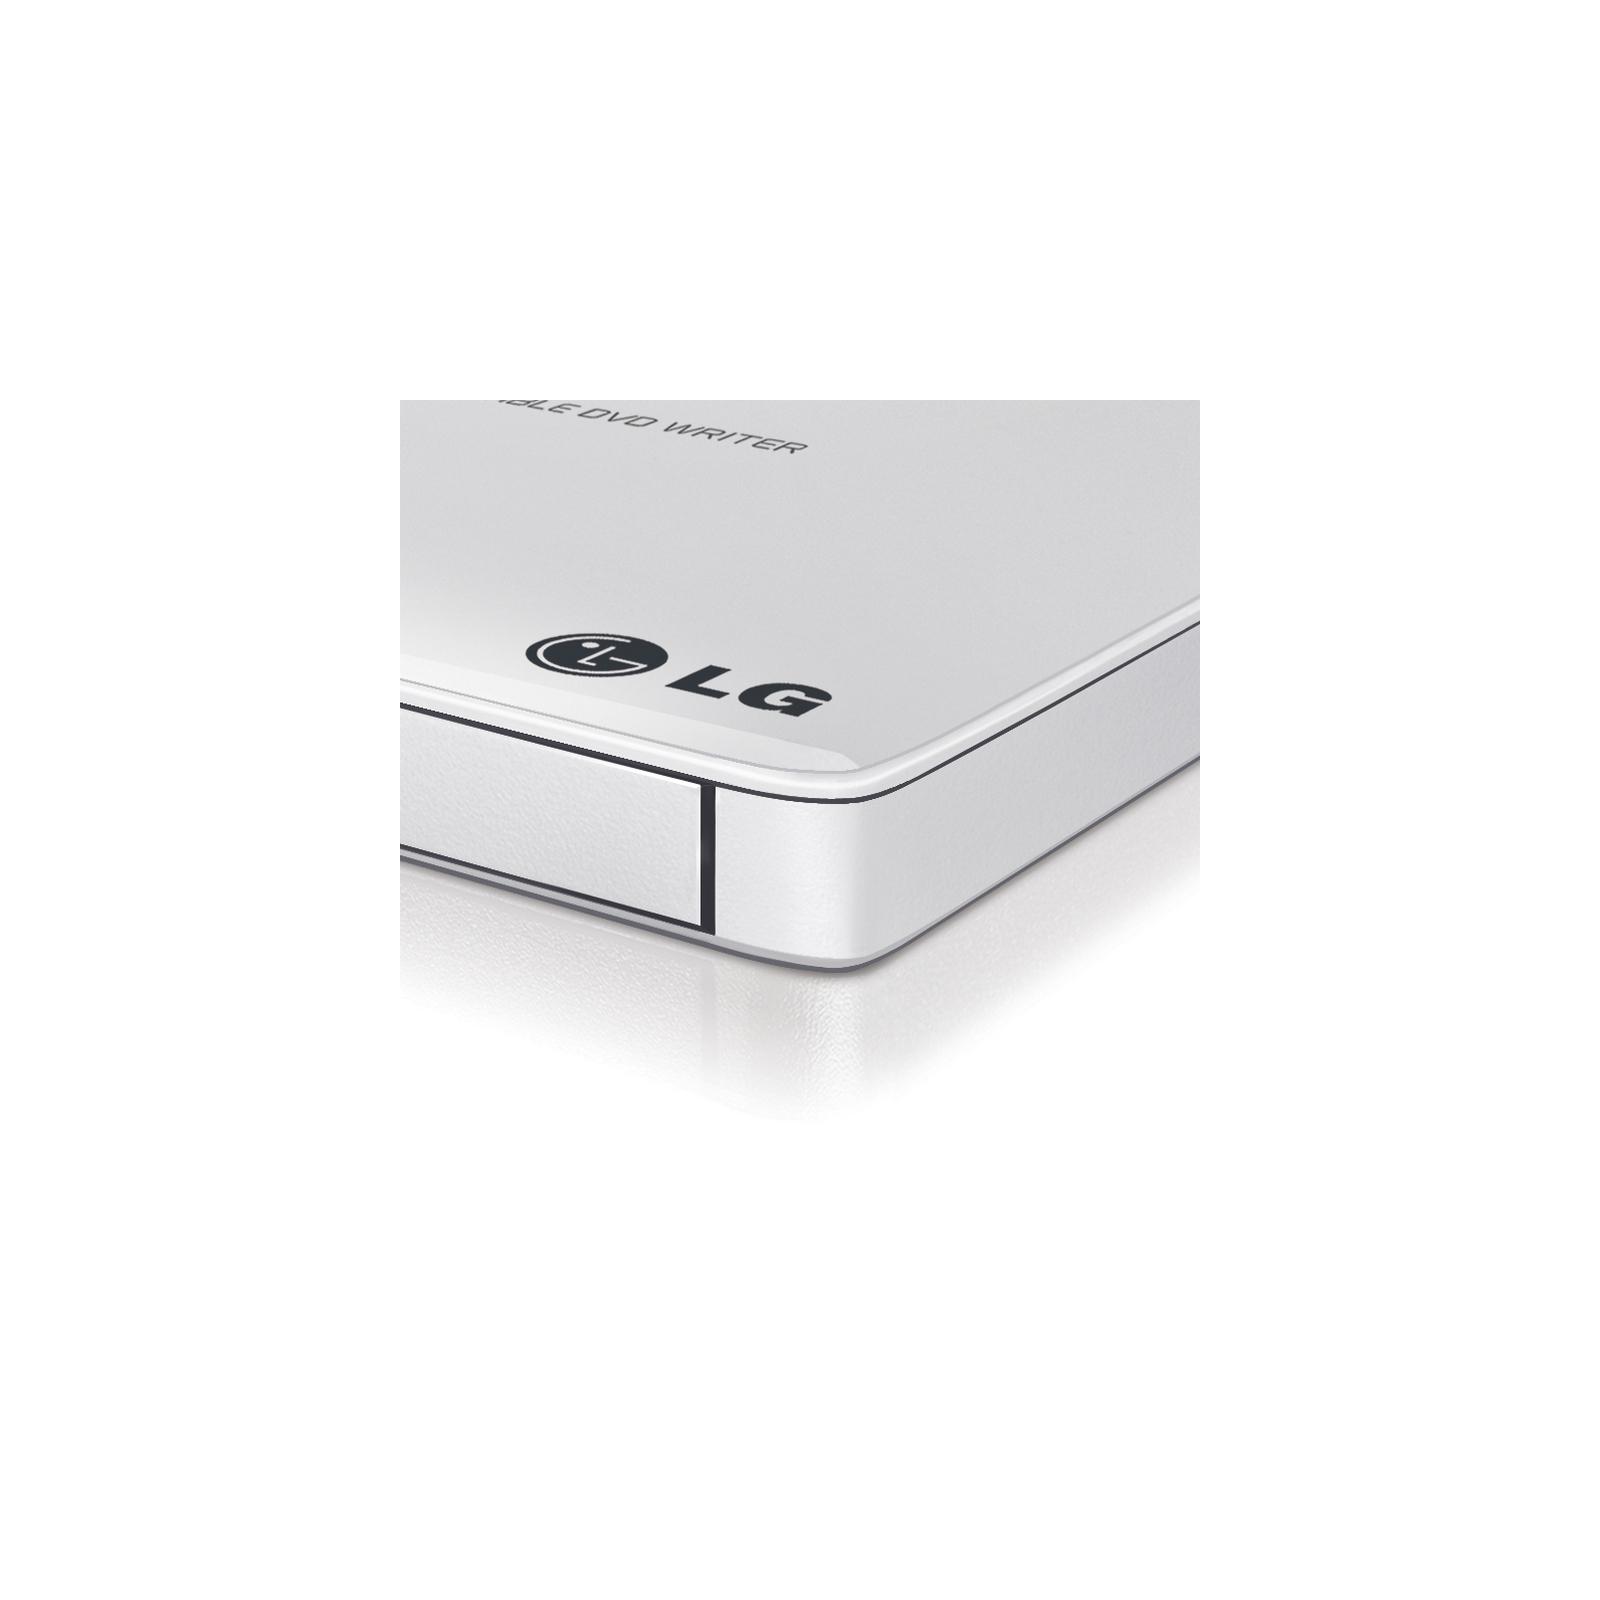 Оптический привод DVD±RW LG ODD GP57EW40 изображение 2